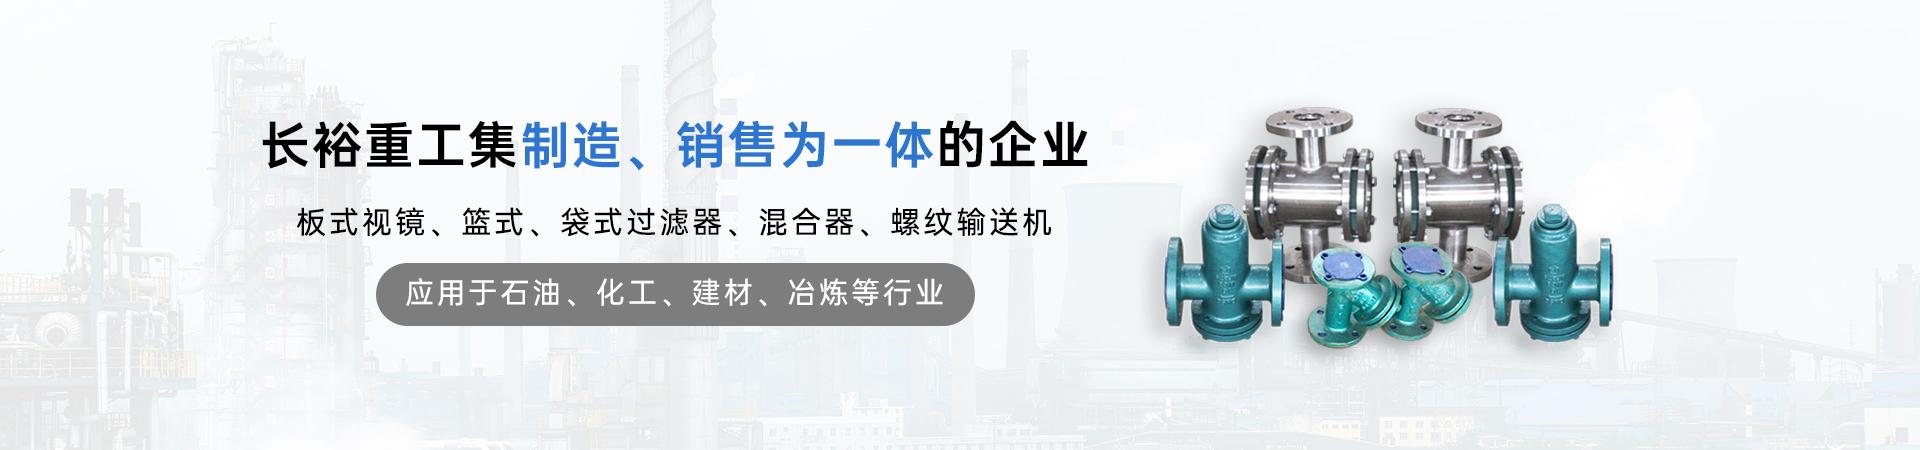 http://www.zgcyzg.cn/data/upload/202101/20210112130910_678.jpg